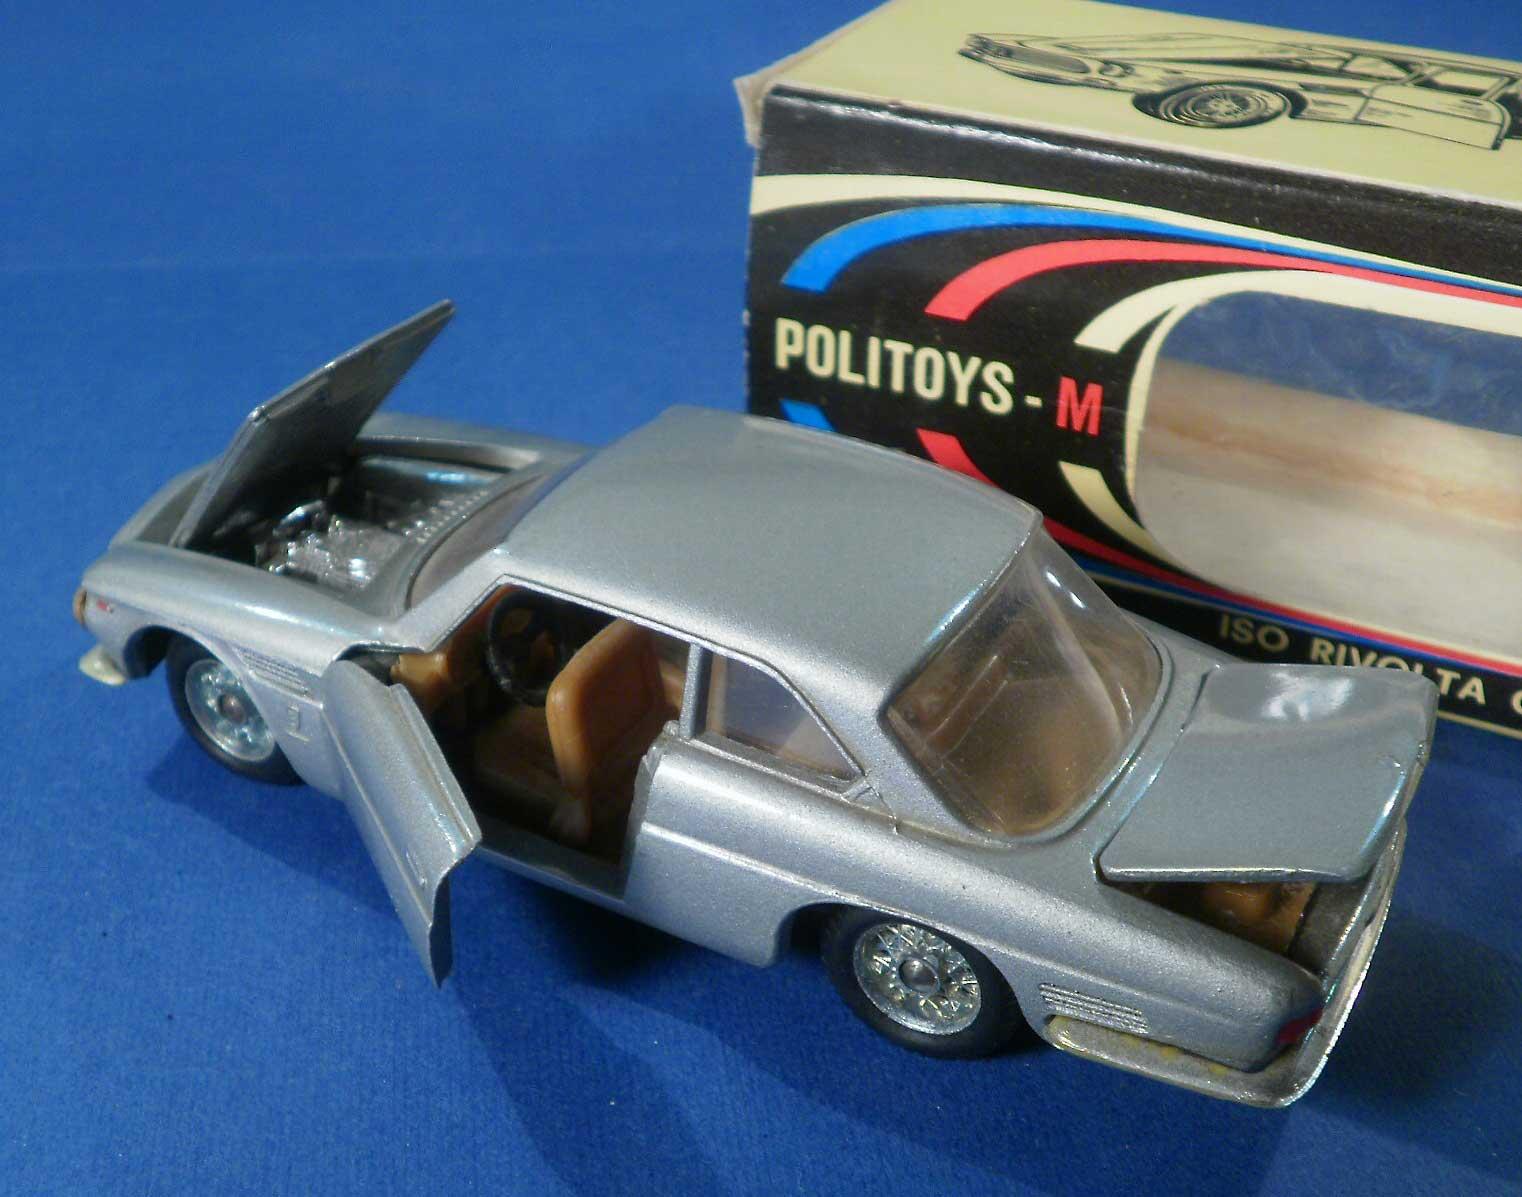 Politoys Polistil M515, ISO Rivolta Coupe GT